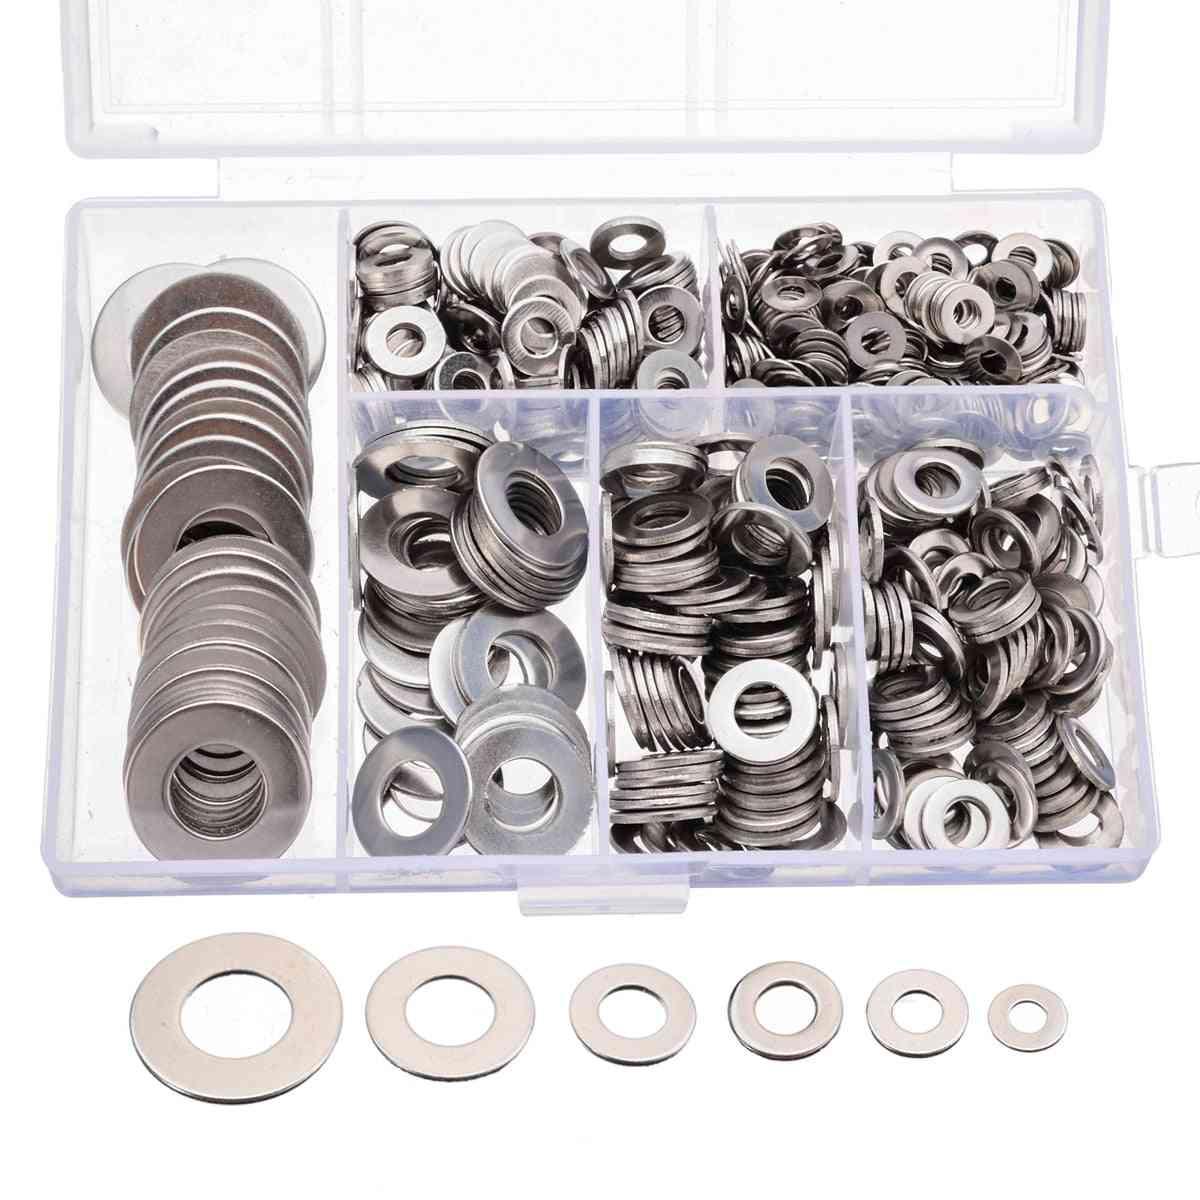 660pcs Of Stainless Steel Plain Washer Kit